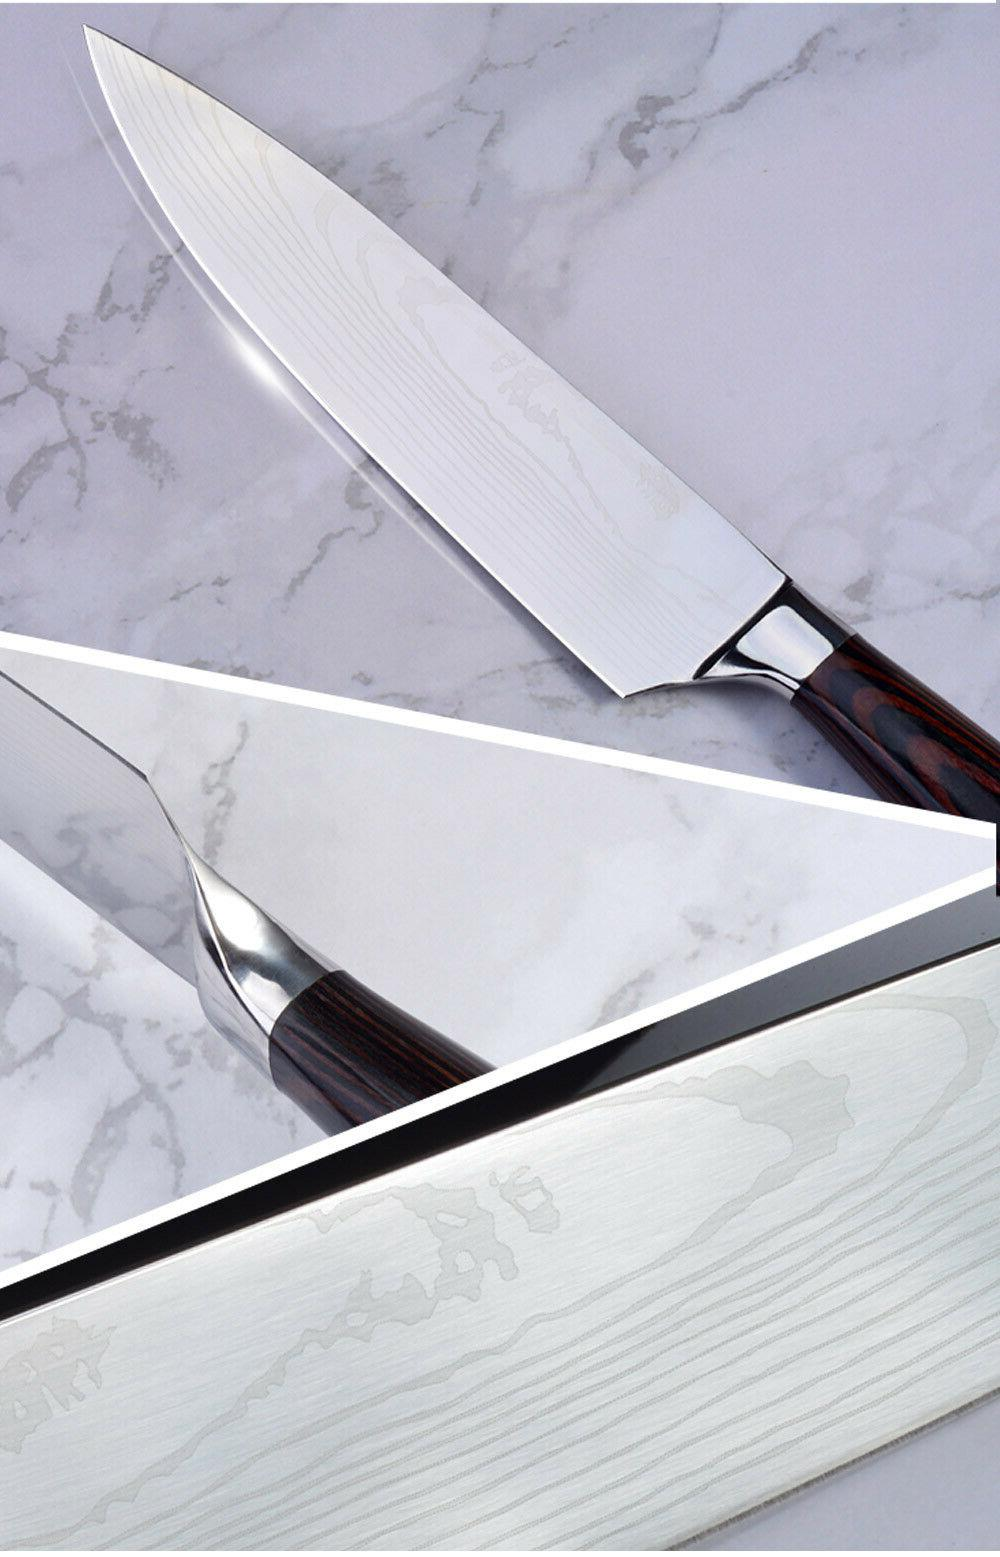 Japanese Stainless Kitchen Knives Set 7 Damascus